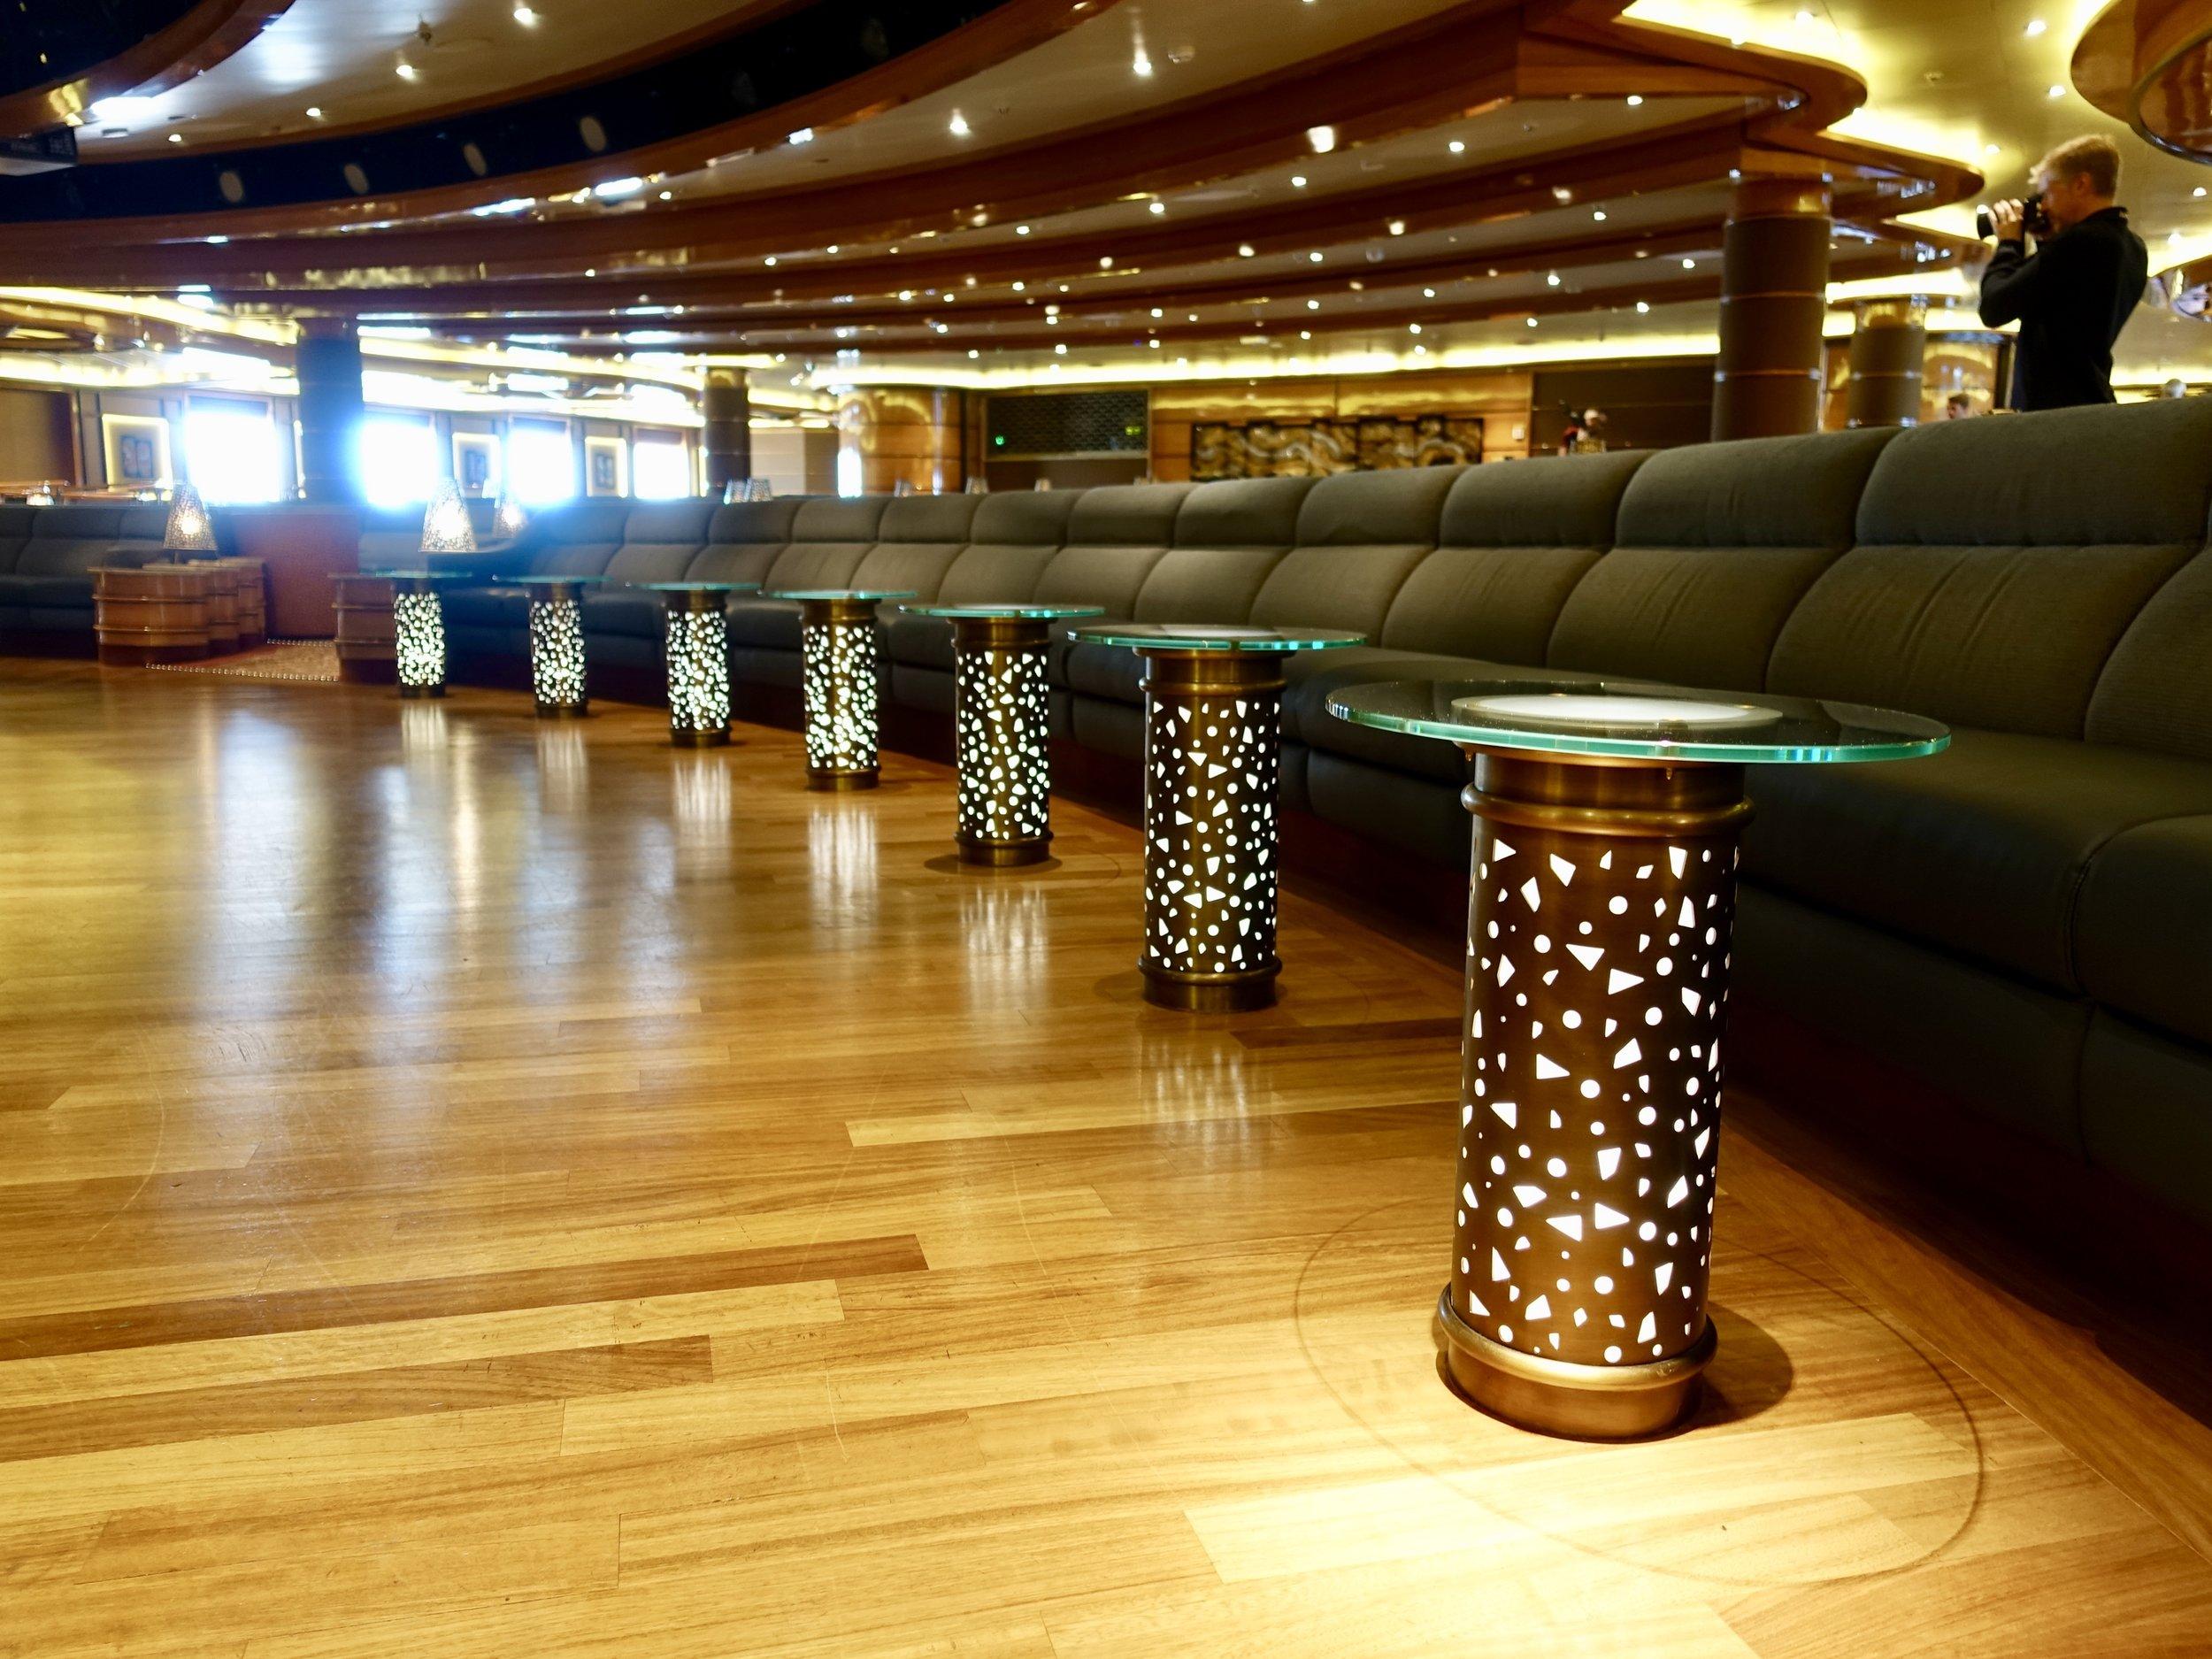 The Vista Lounge